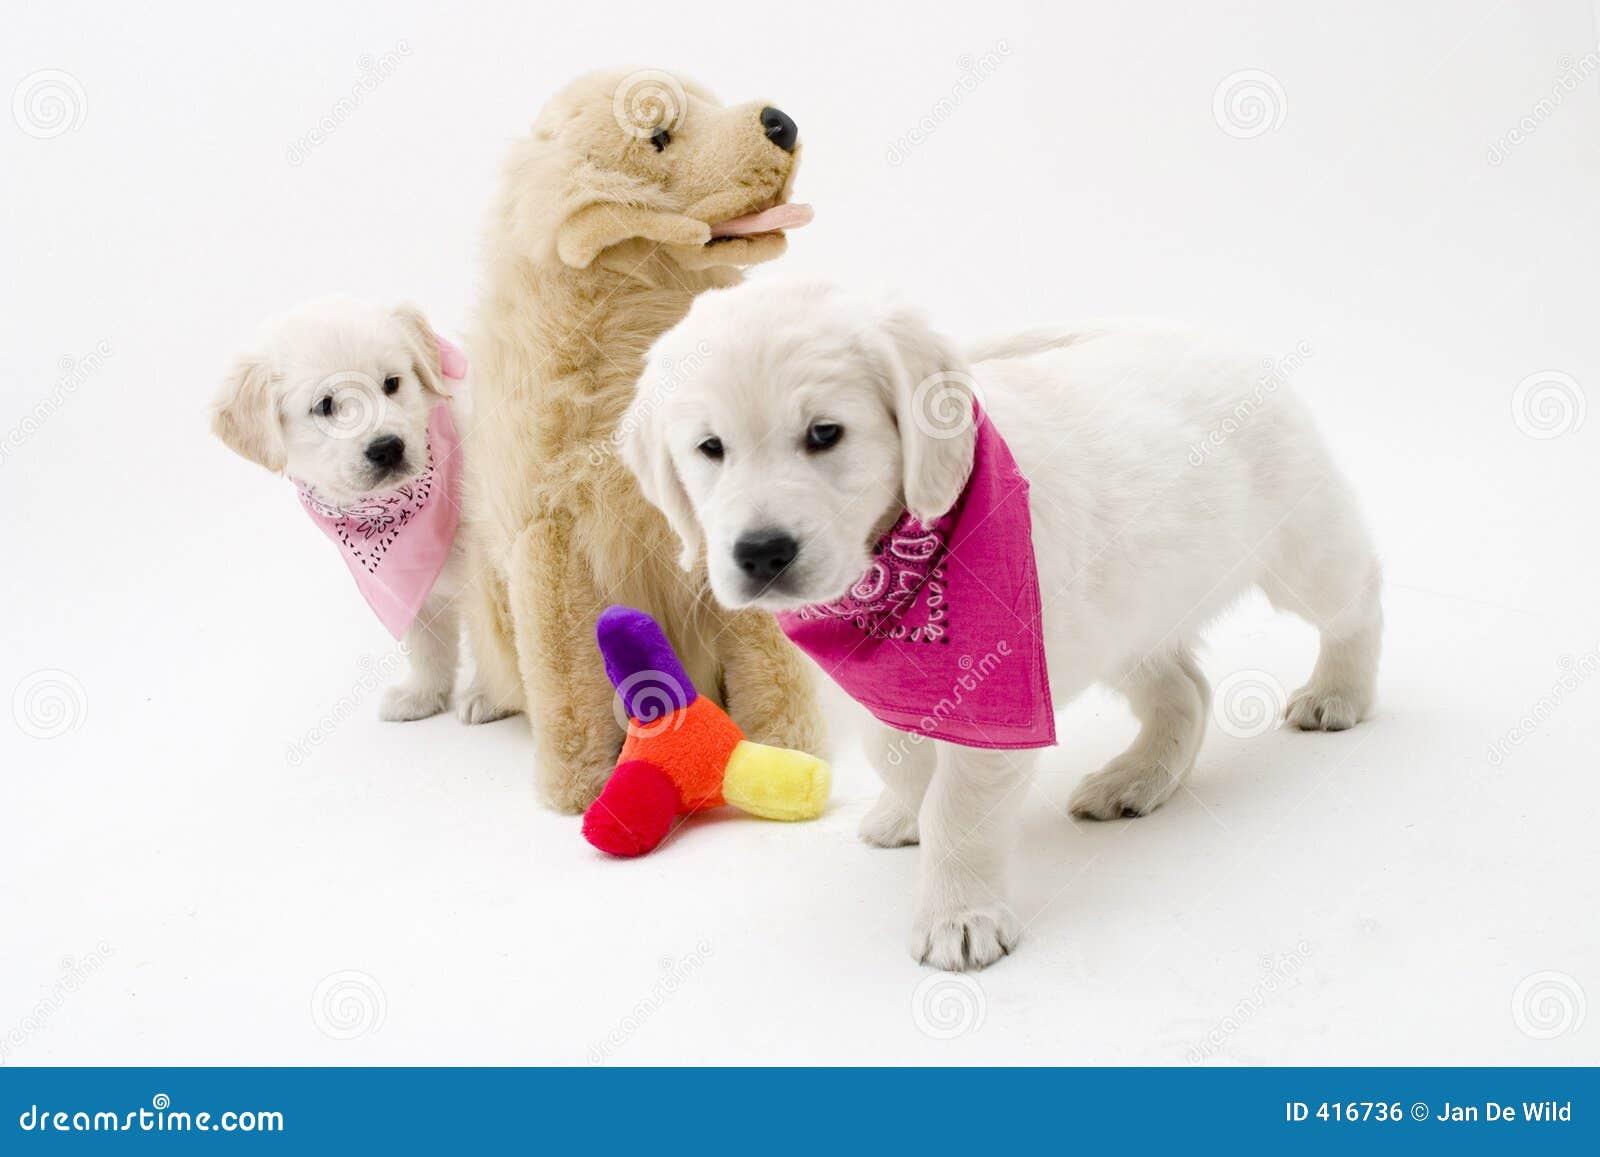 nice puppies - Imgur